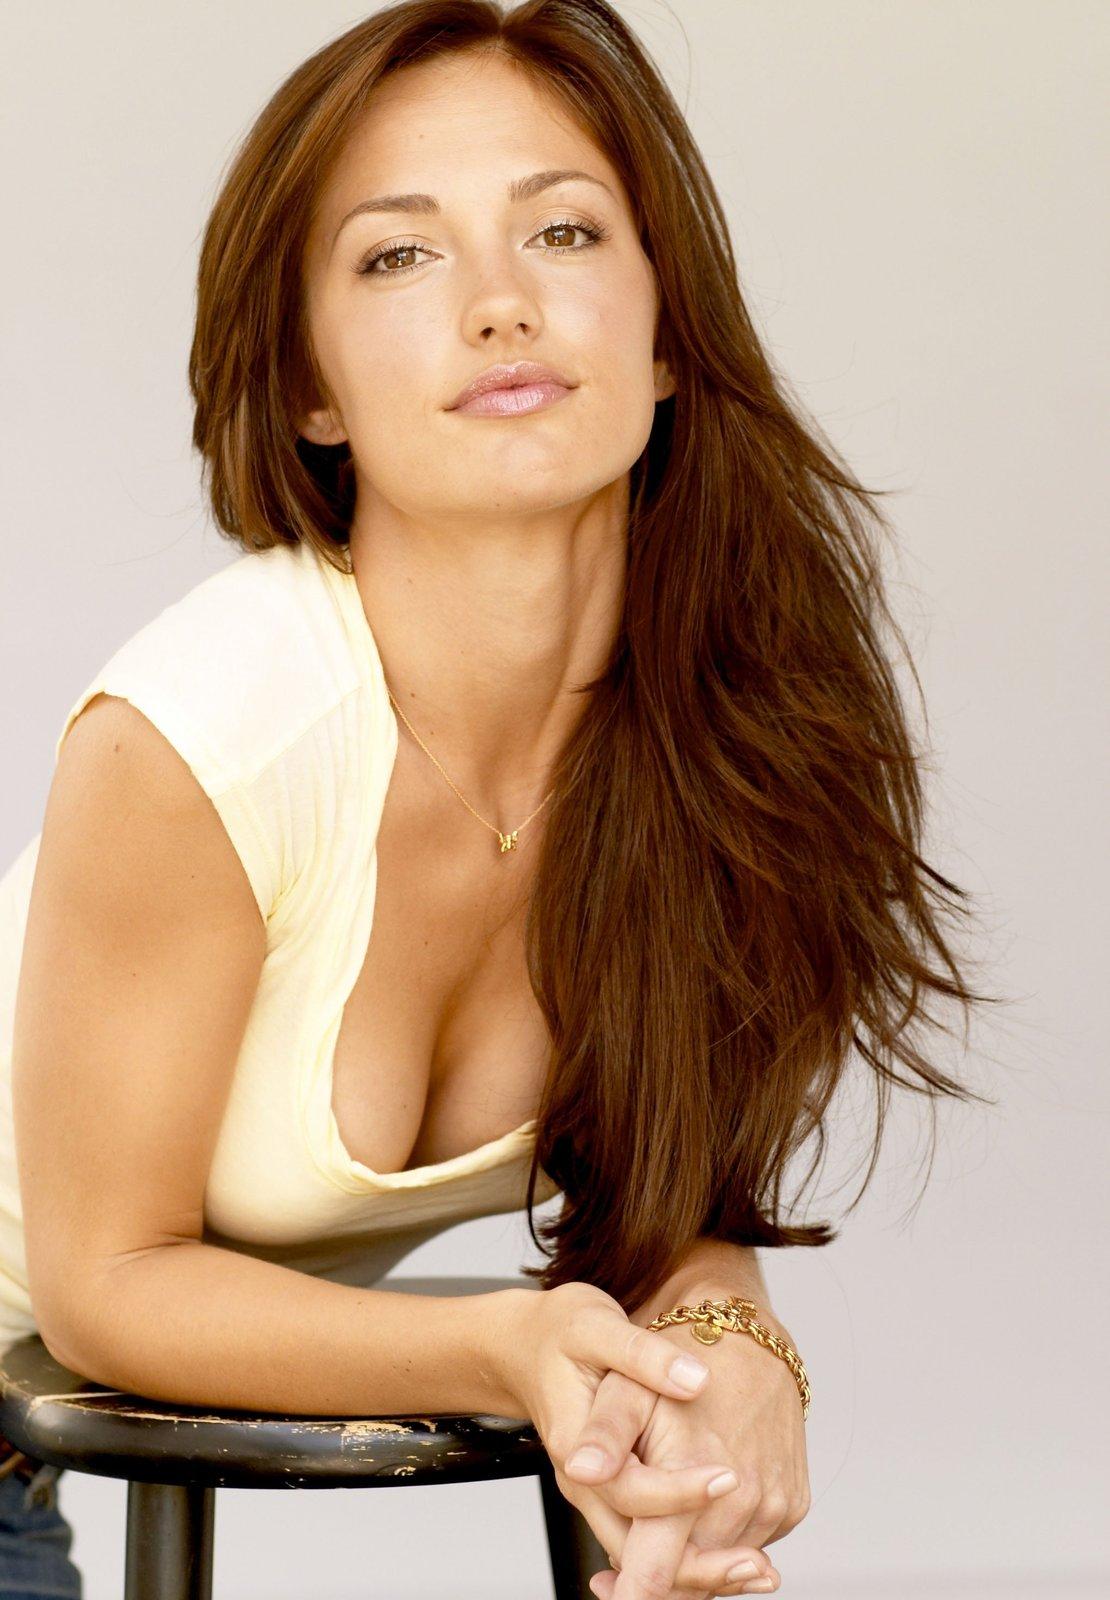 Site kelly minka sexiest woman alive think